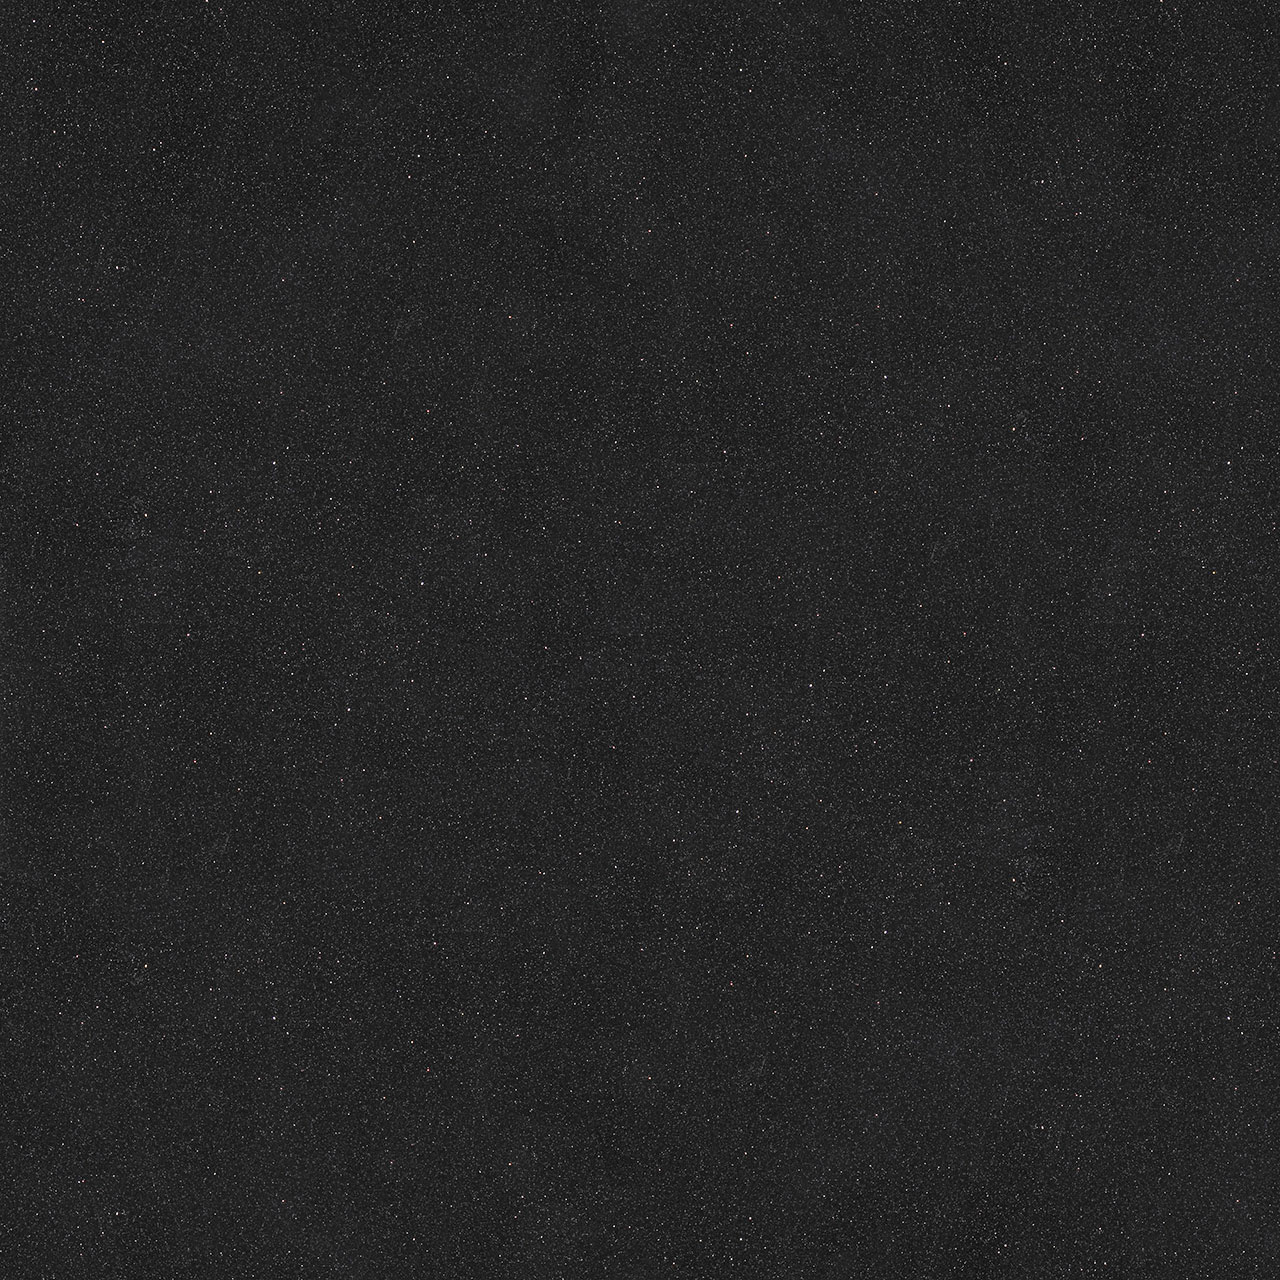 KUMA Granit Jet Gloss